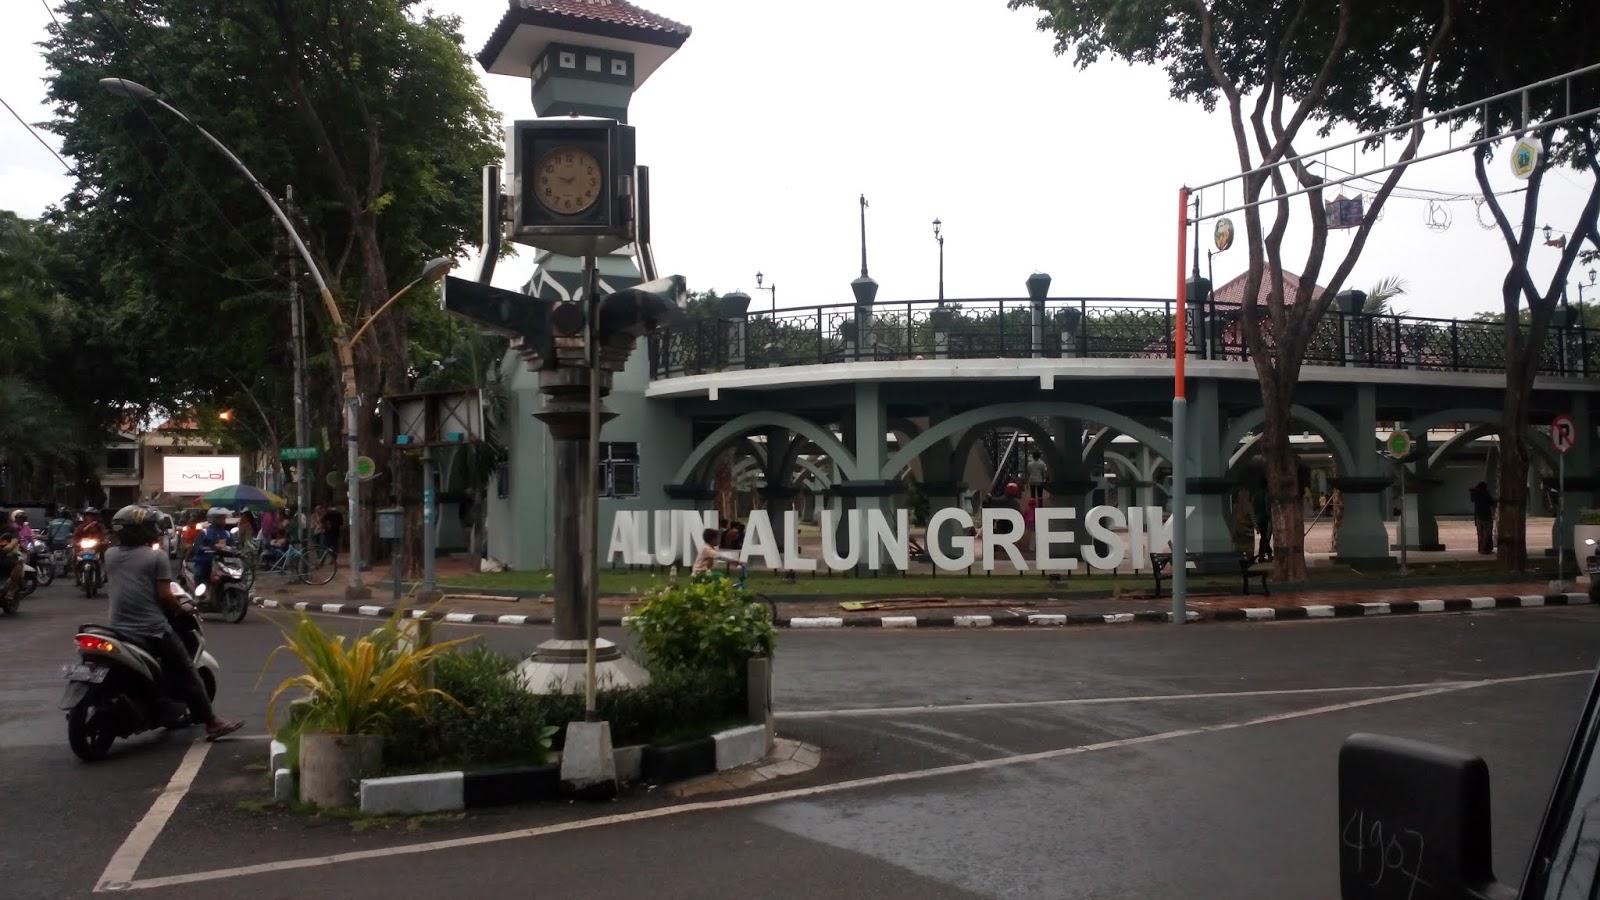 Masjid Jami Gresik yang terletak di seberang jalan Alun-Alun Gresik